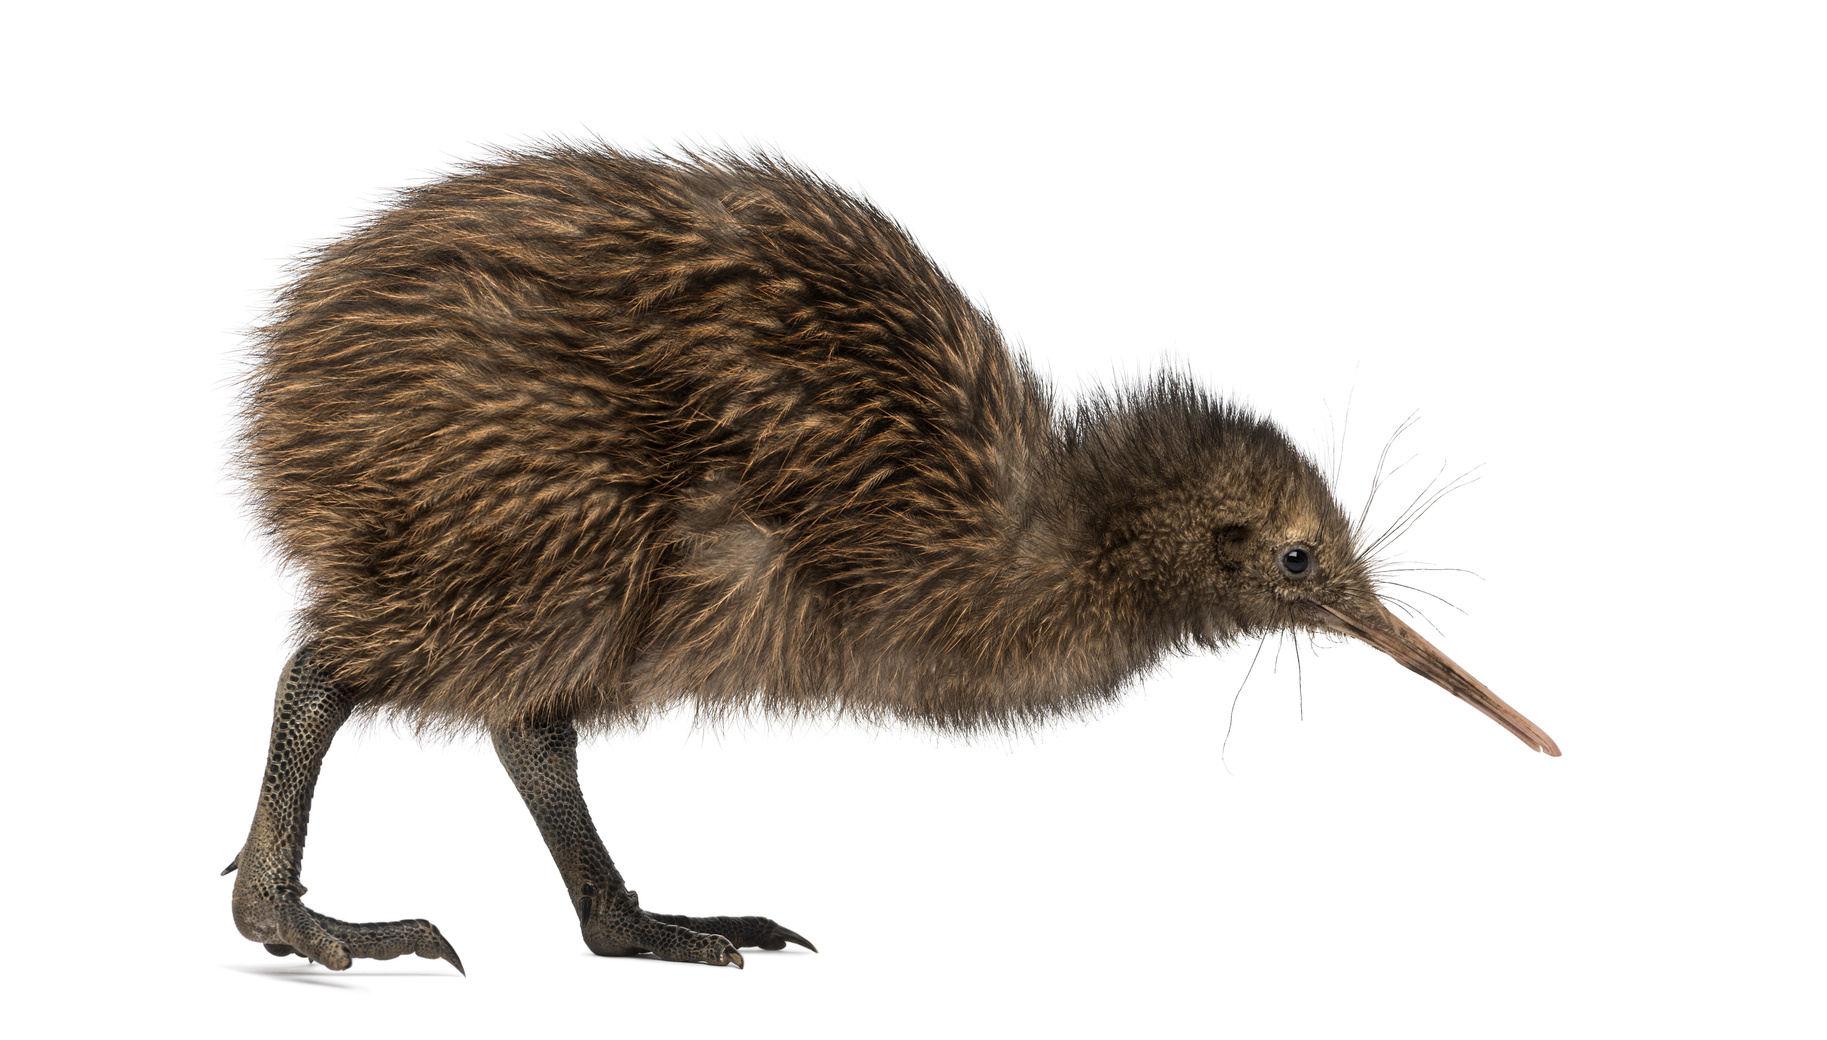 kiwi bird – Telecoms.com